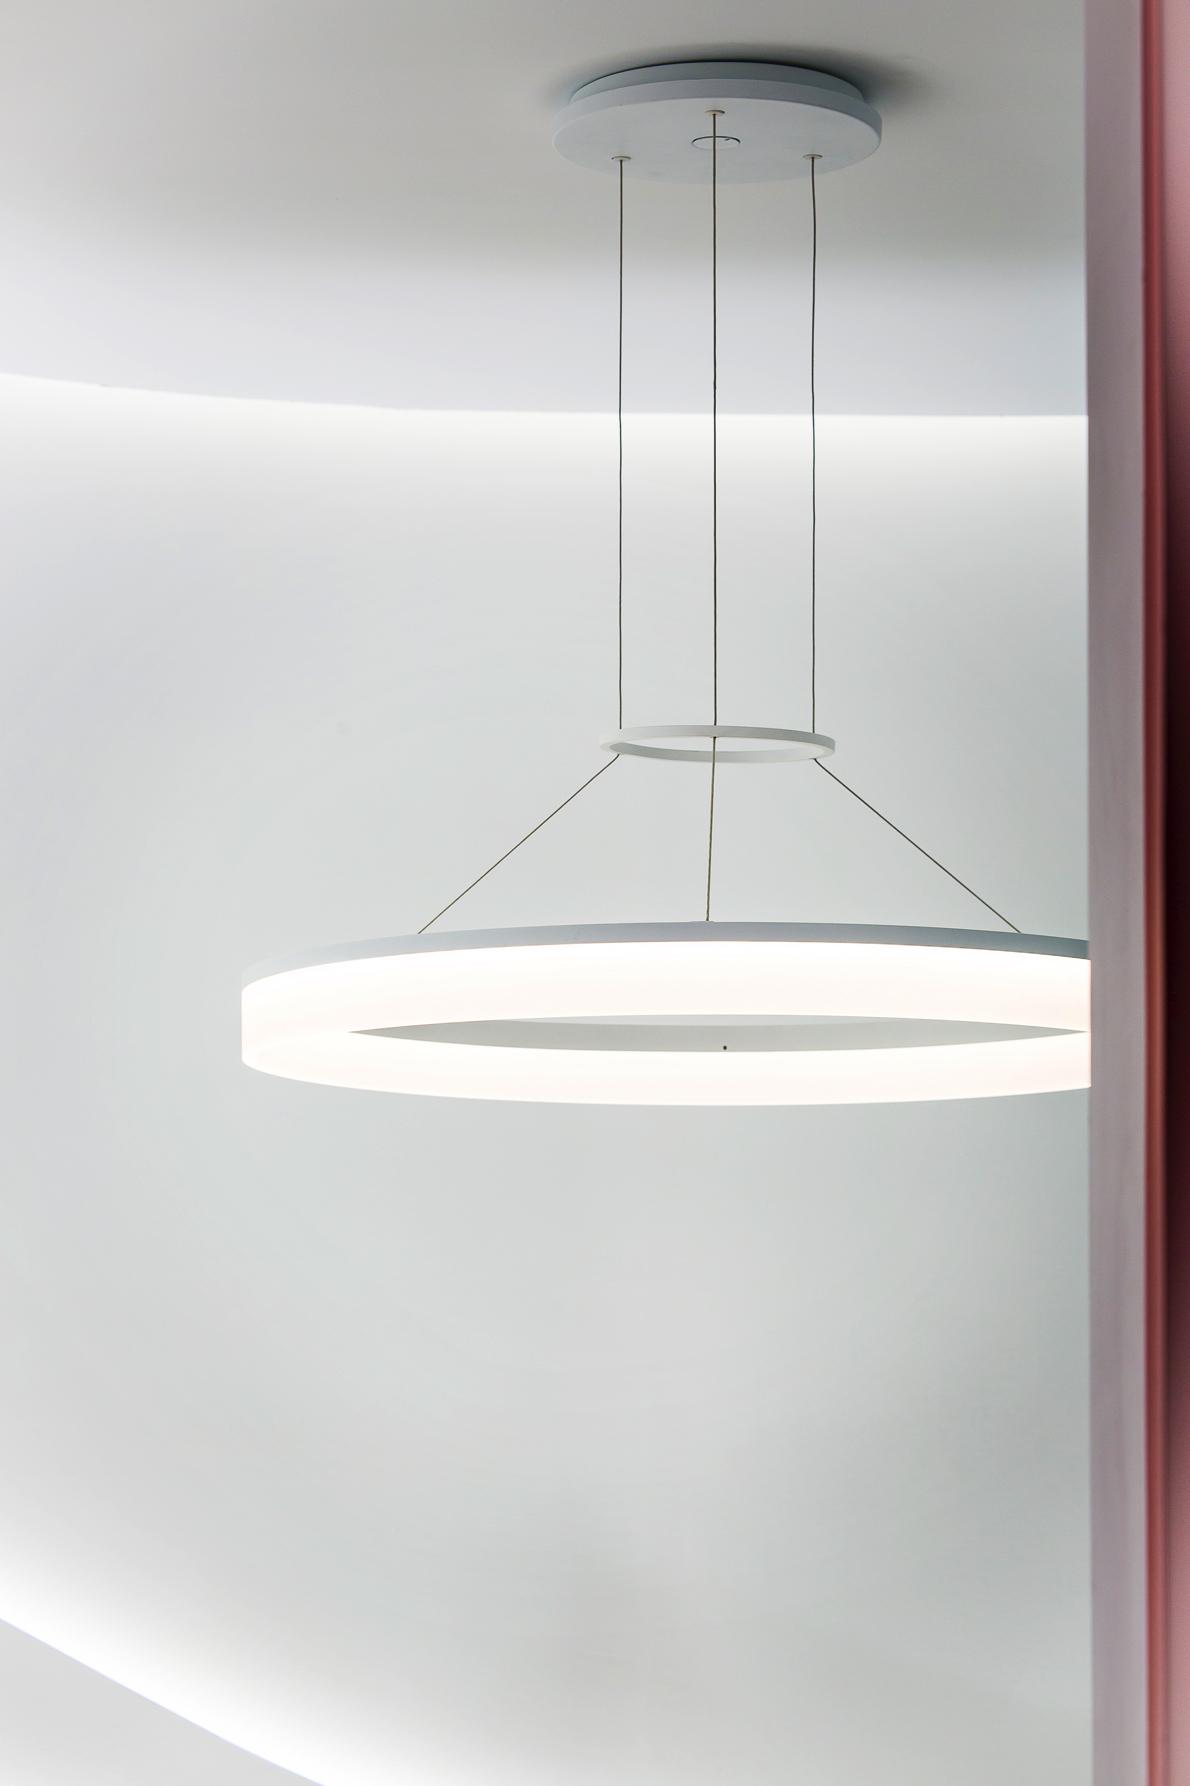 Luminaria suspendida Circ de Leds C4 en el espacio de Escenium